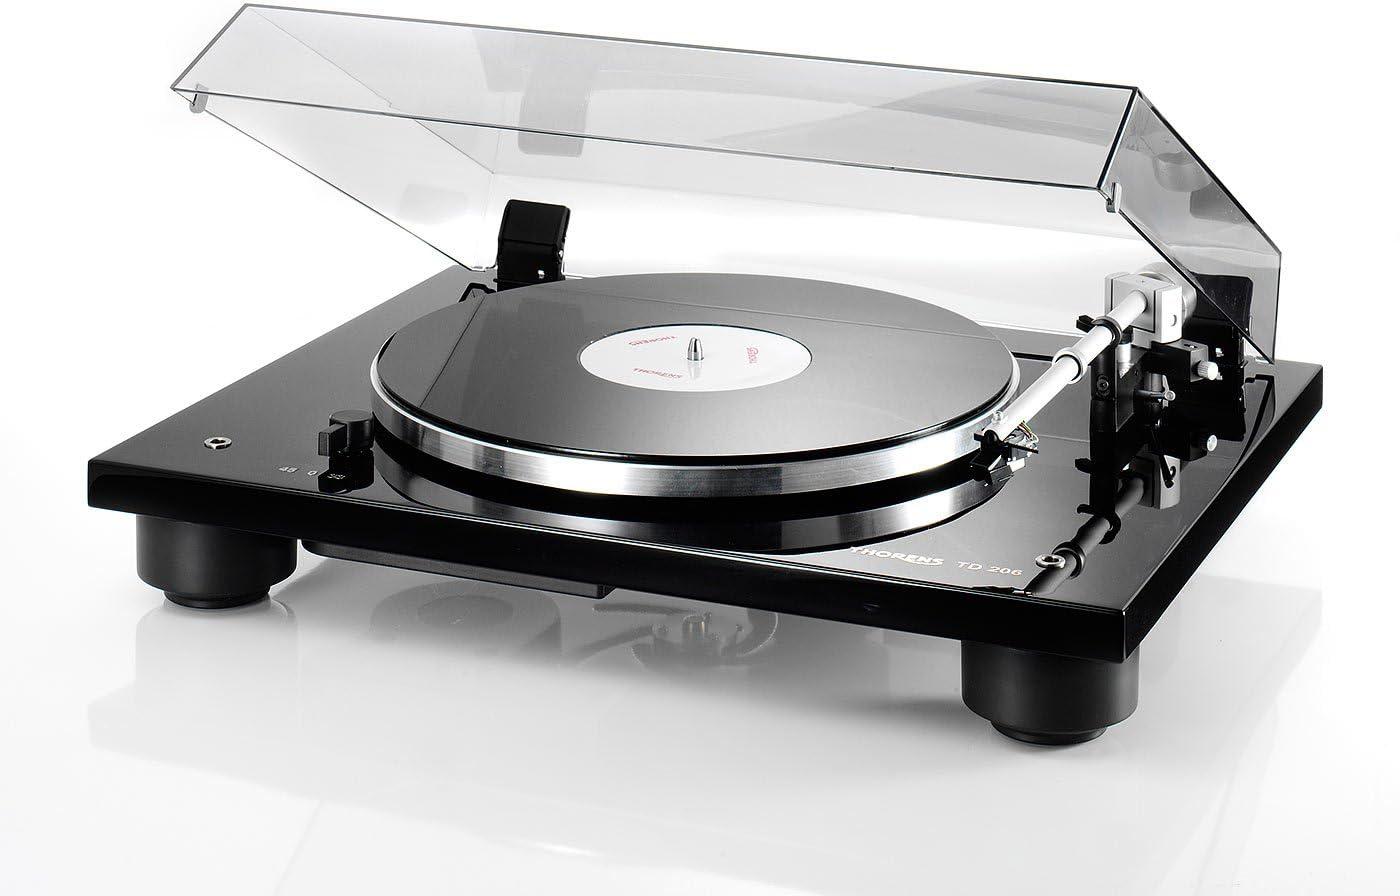 Thorens TD 206 Manual Turntable – 33 or 45 rpm TP90 AT95B High Gloss Black